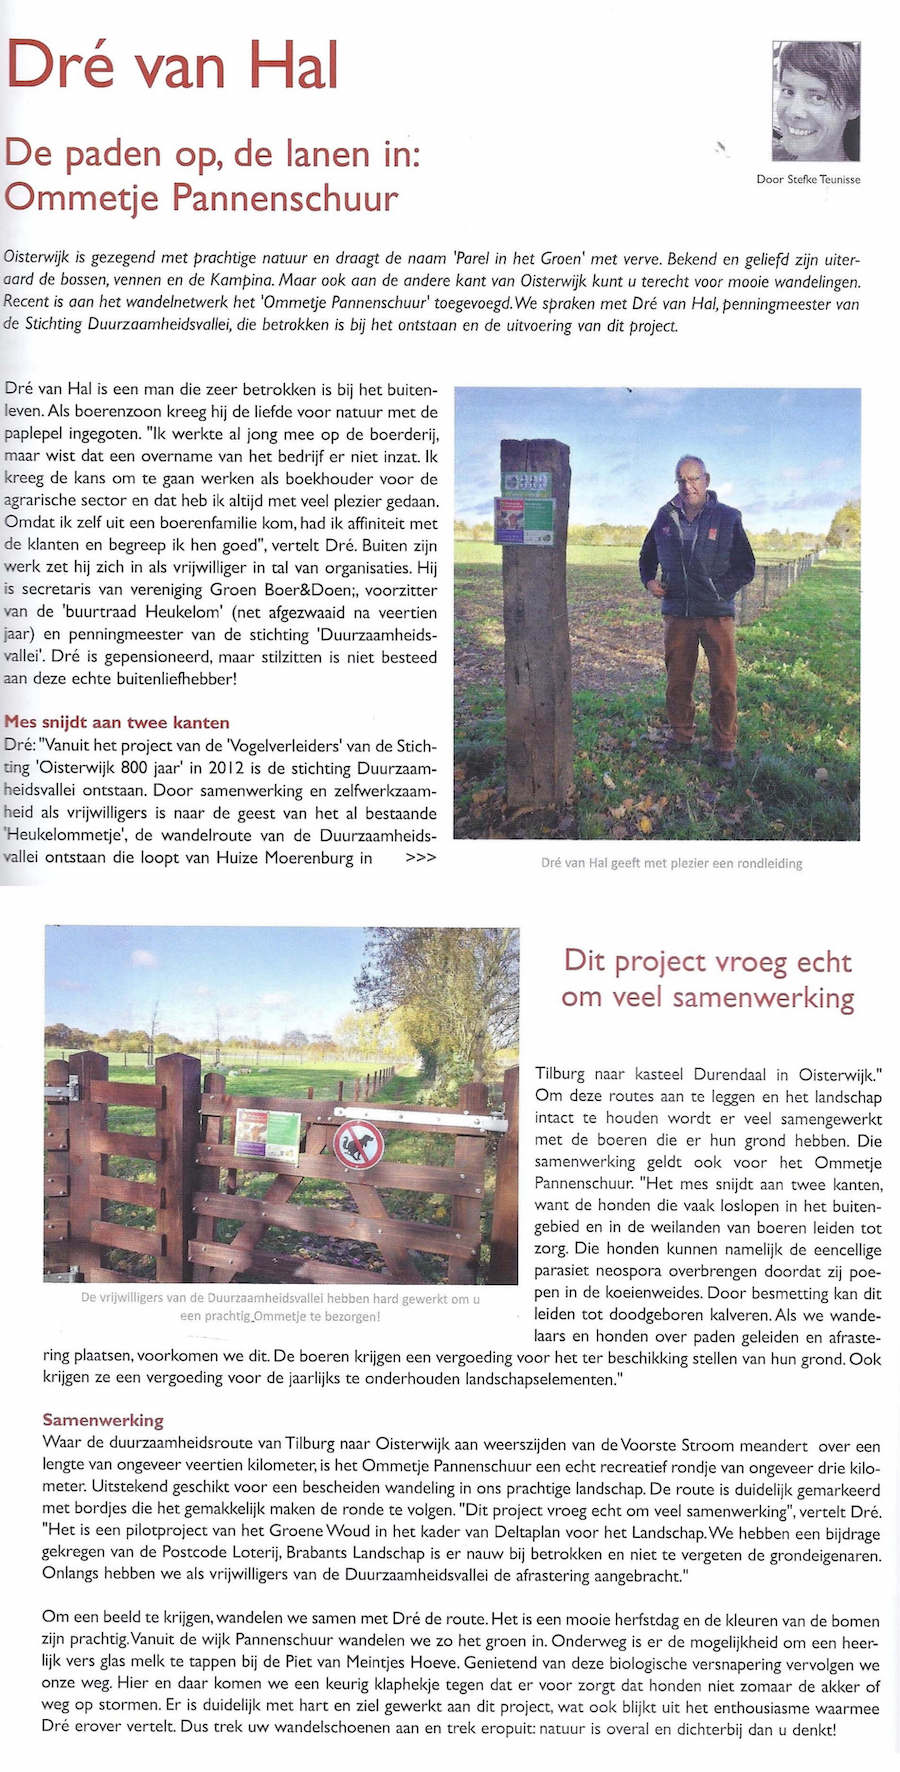 Duurzaamheidsvallei - project Ommetje Pannenschuur